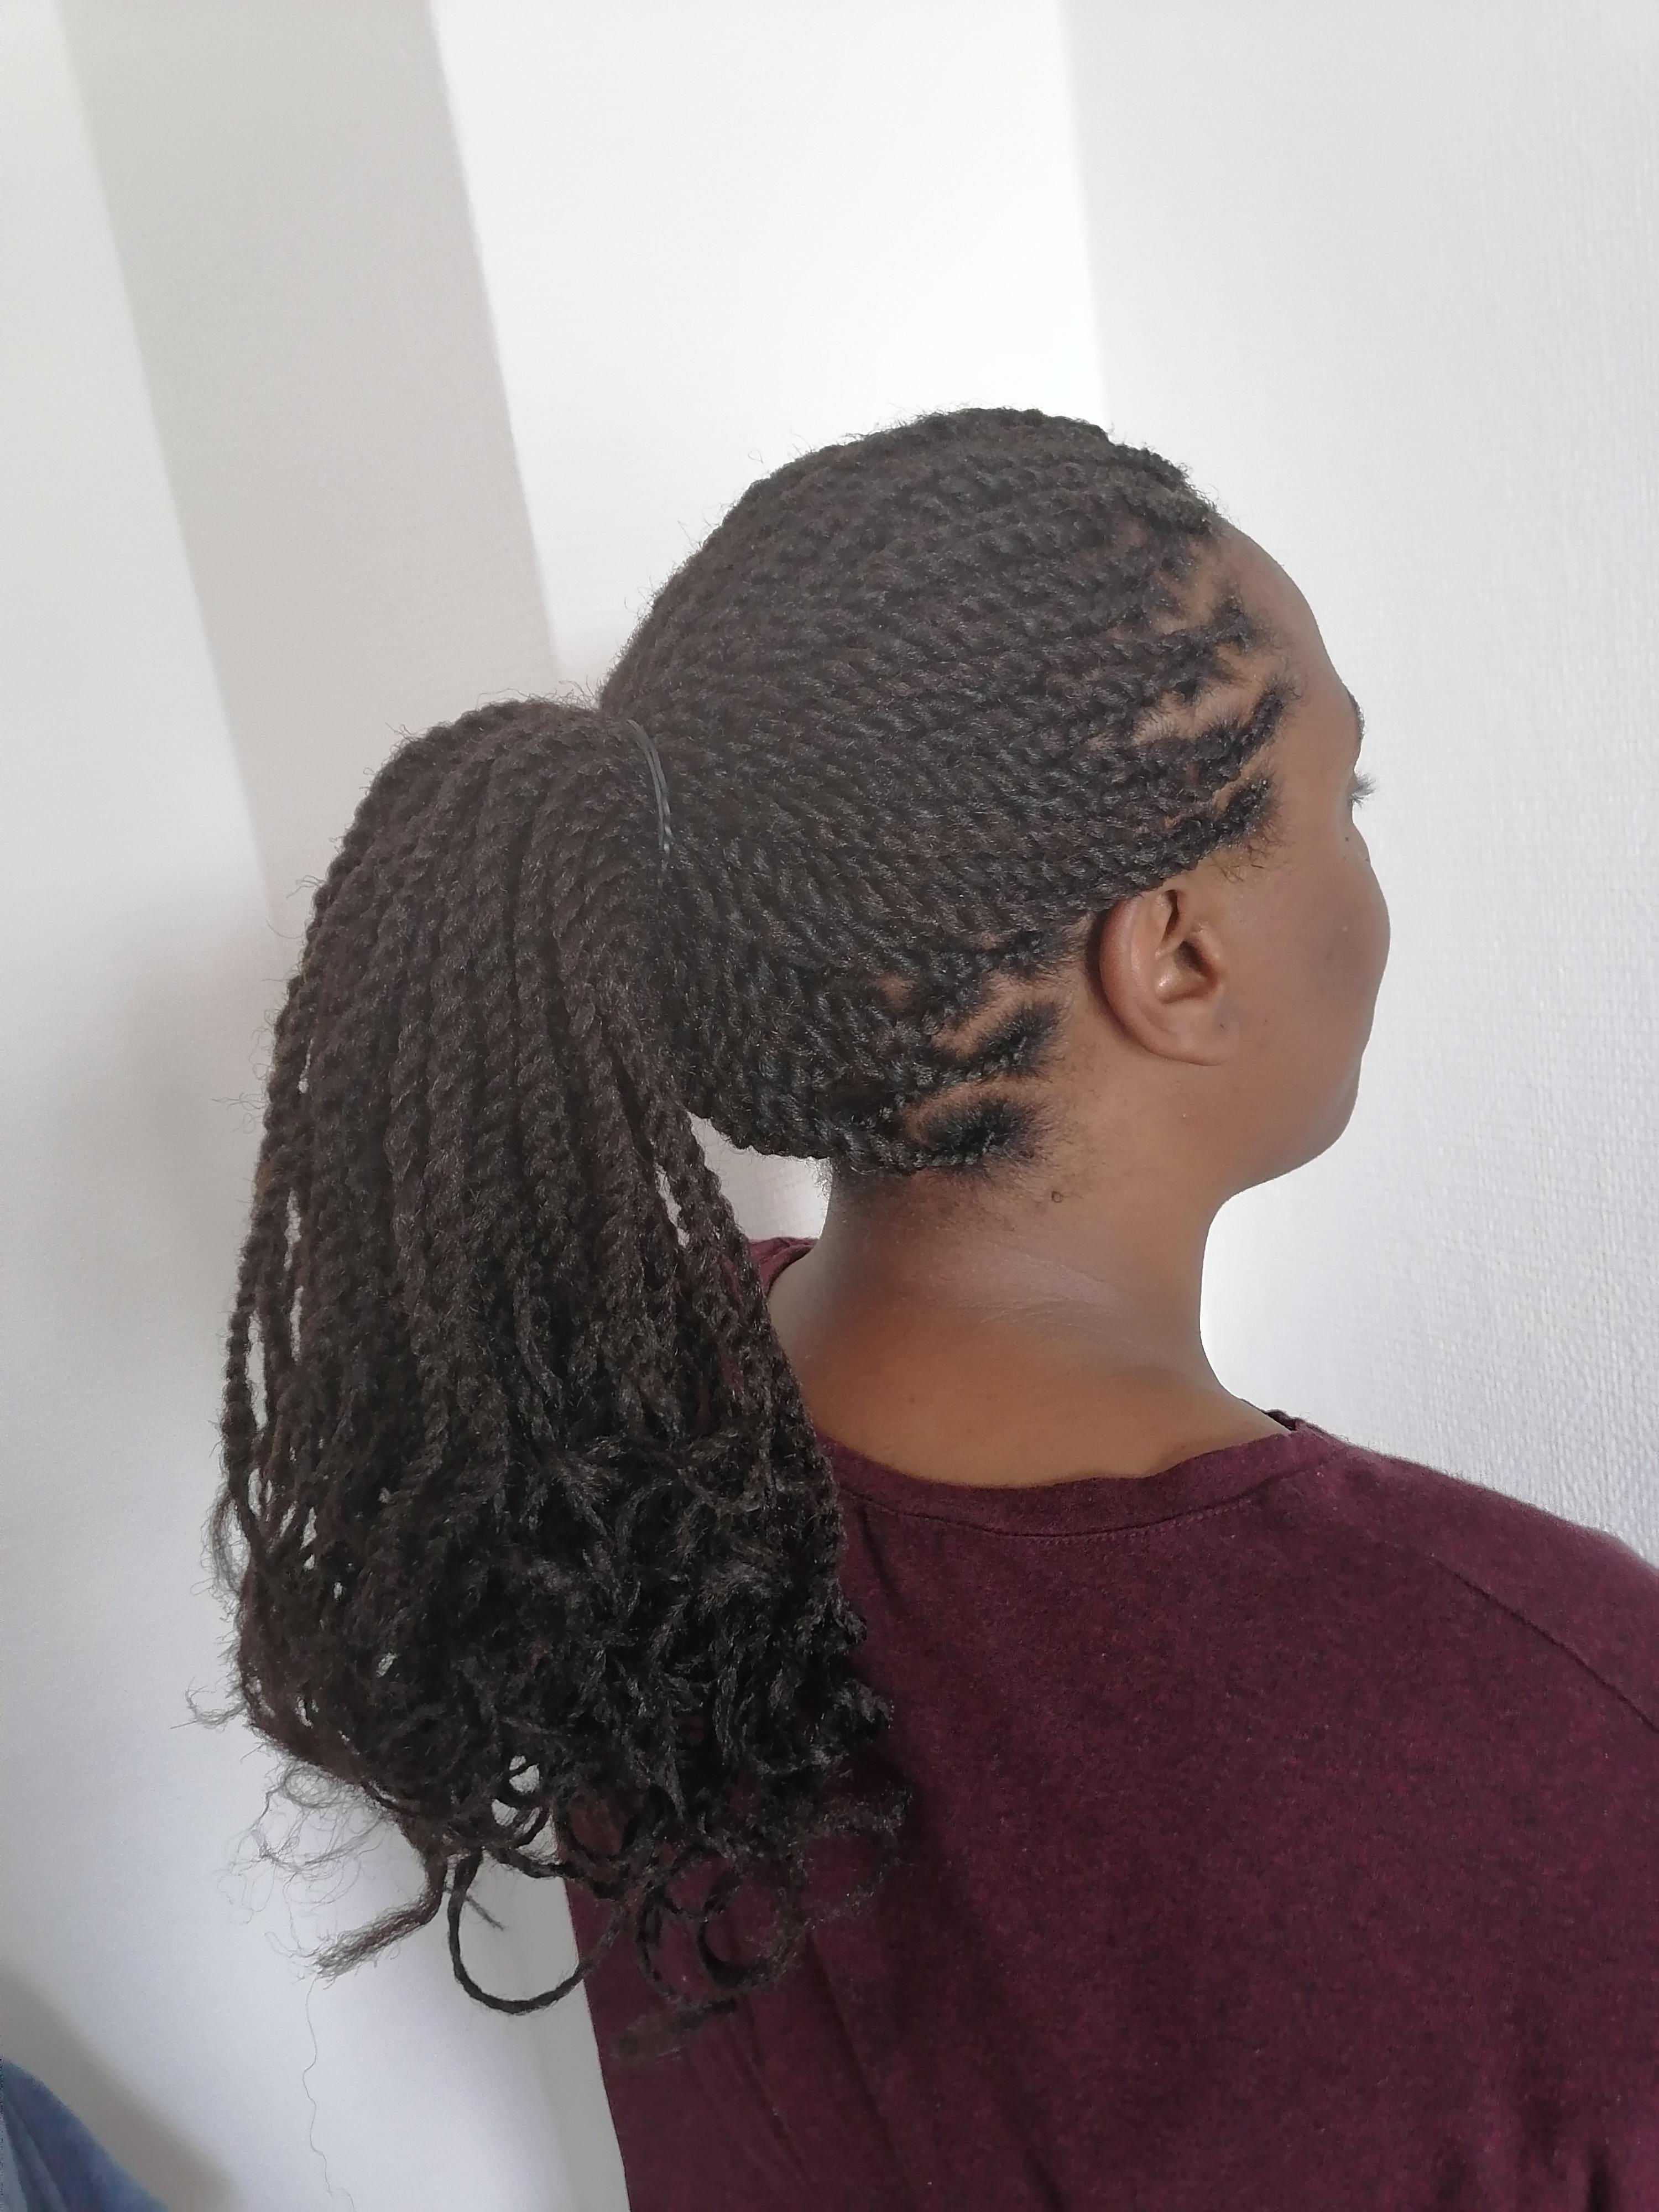 salon de coiffure afro tresse tresses box braids crochet braids vanilles tissages paris 75 77 78 91 92 93 94 95 YVLZXDZA